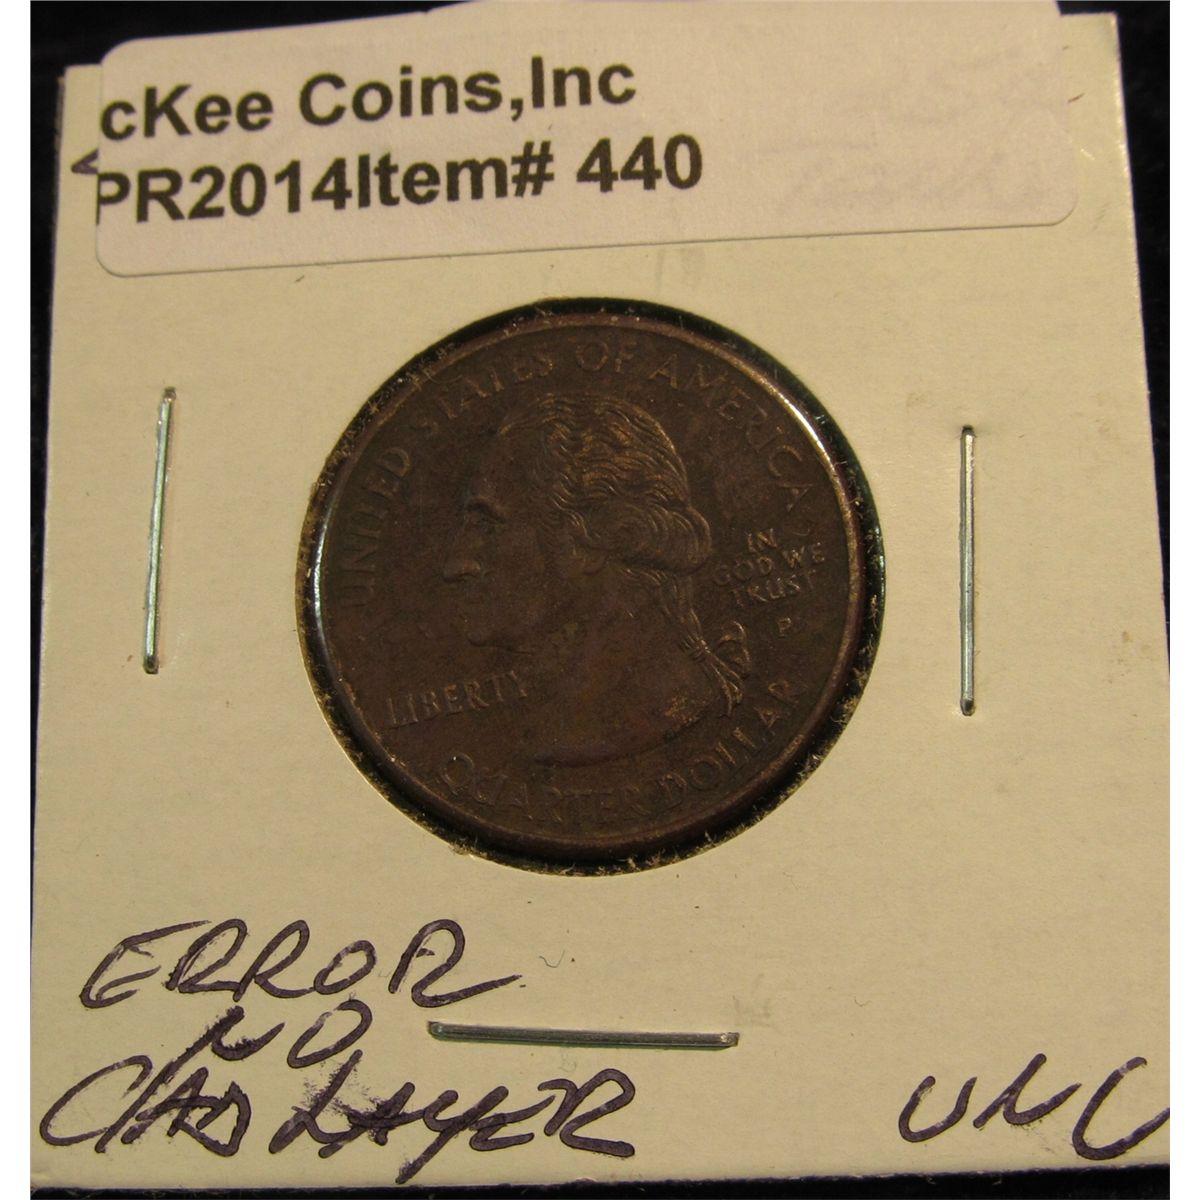 440  2002 Tennessee Statehood Quarter  Mint error missing Clad layer  BU